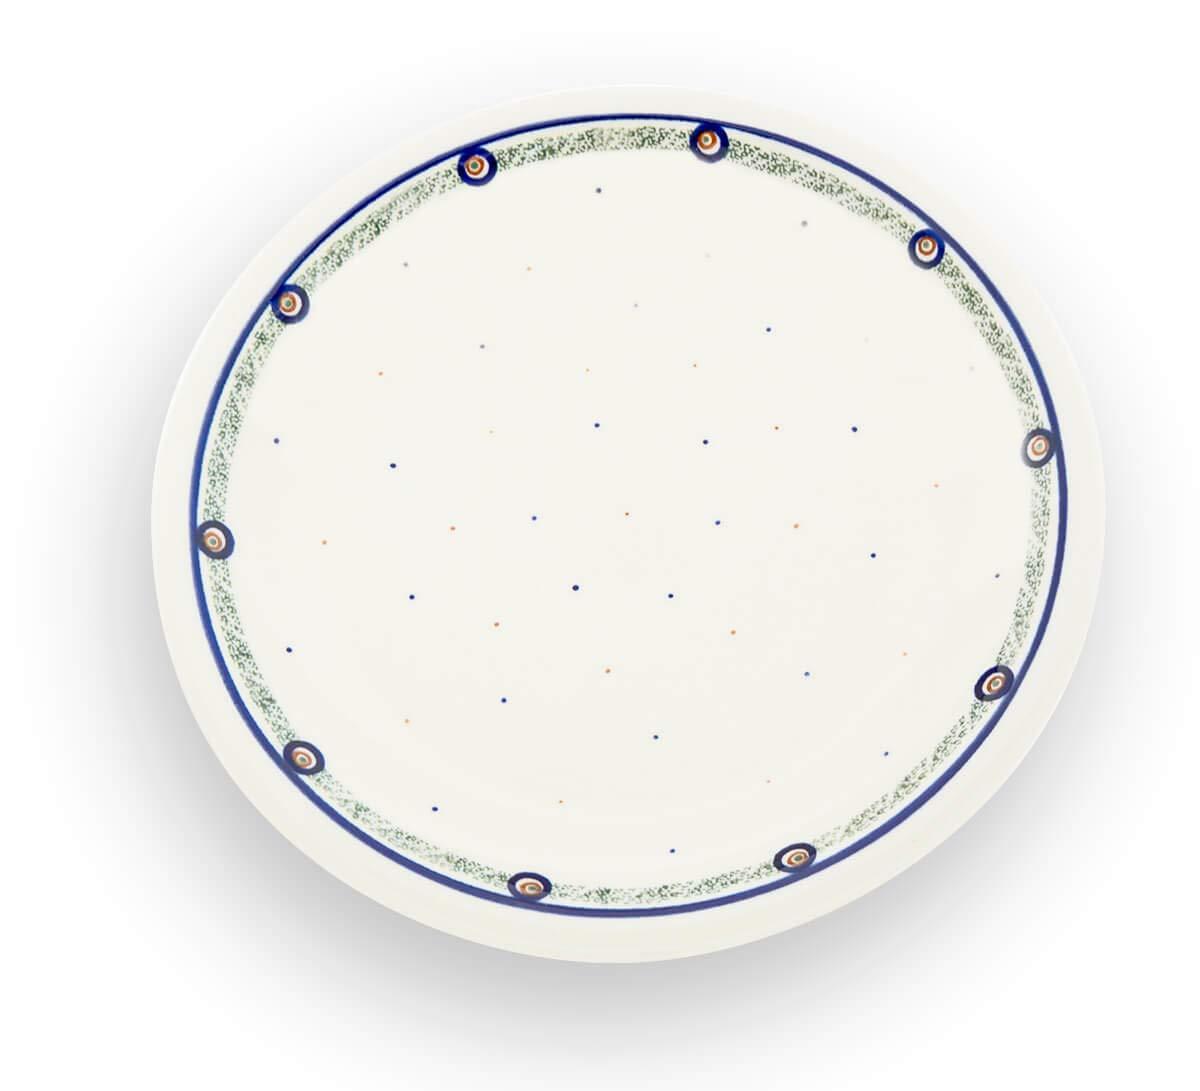 Bunzlauer keramik assiette plate repas gU 1001–114)